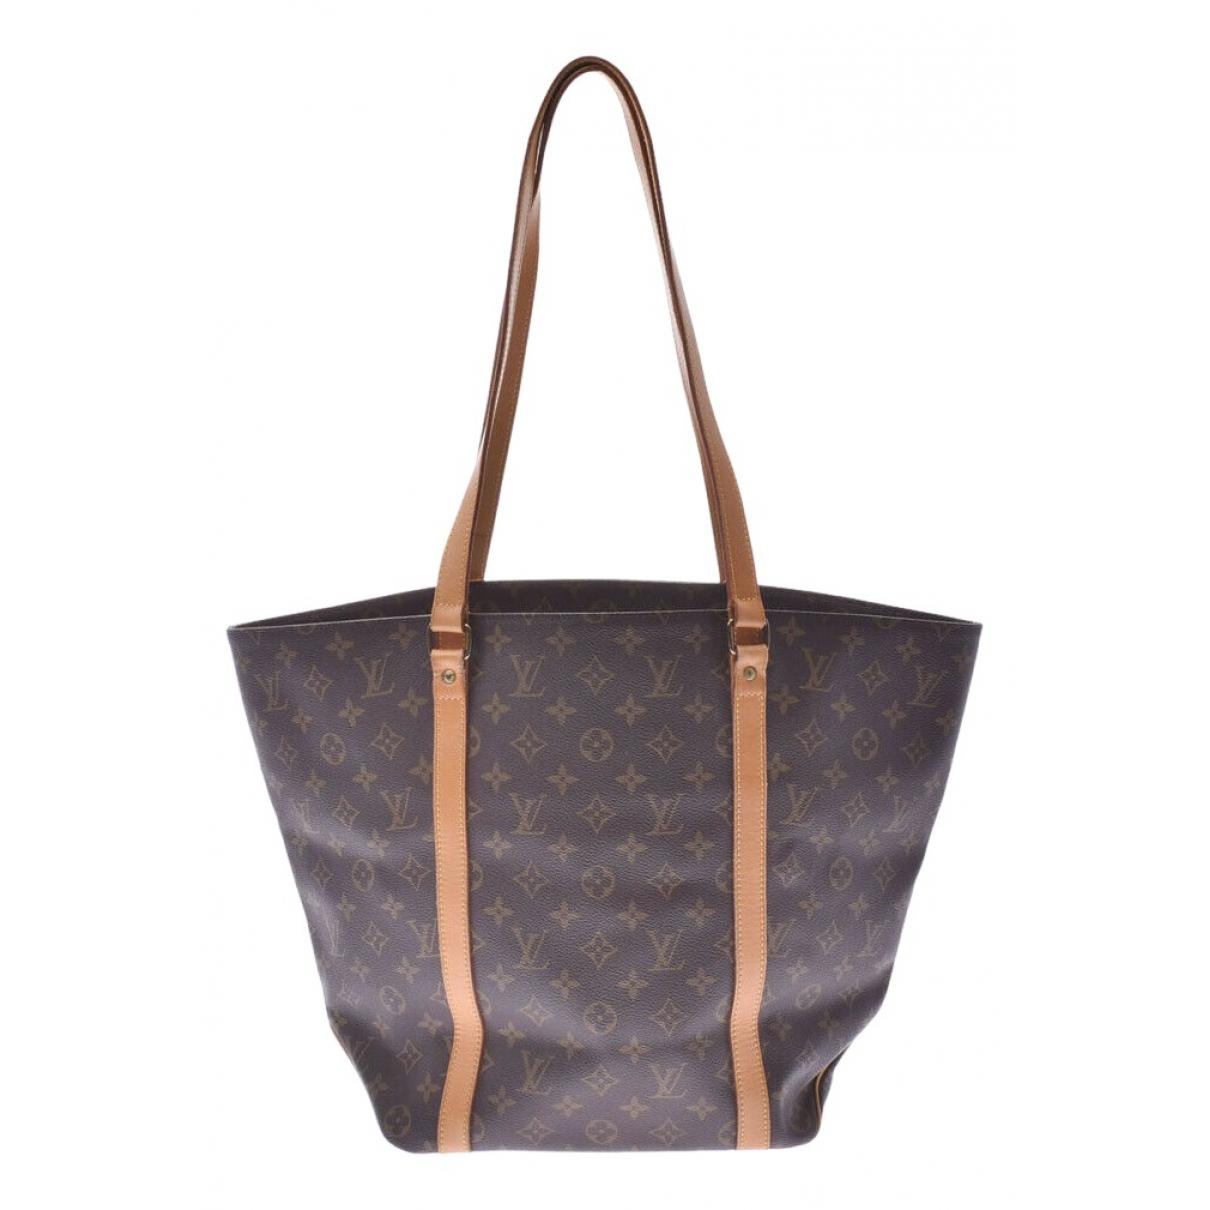 Louis Vuitton - Sac a main Shopping pour femme en toile - marron